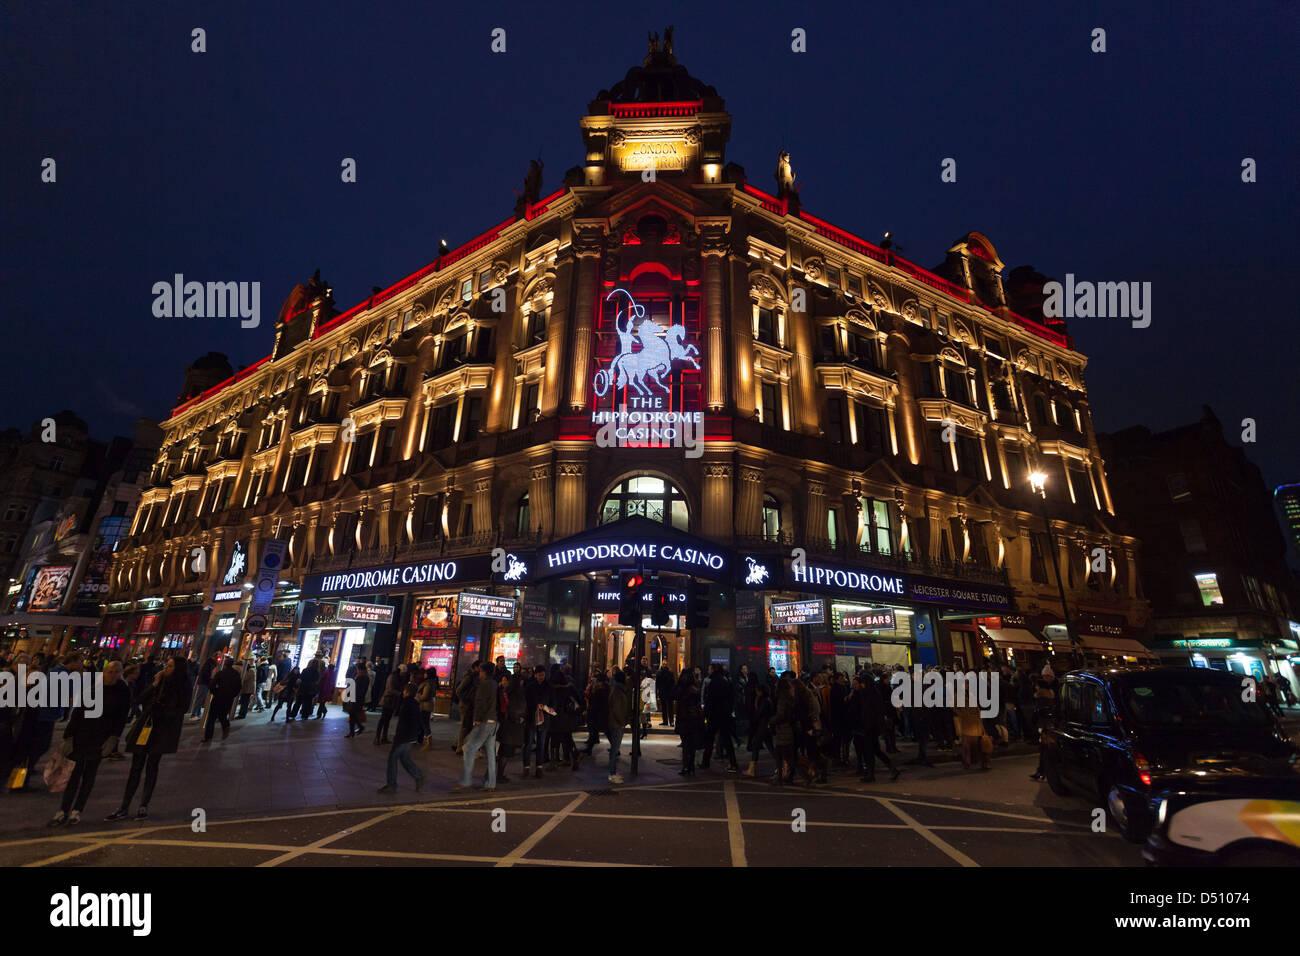 casino in england uk